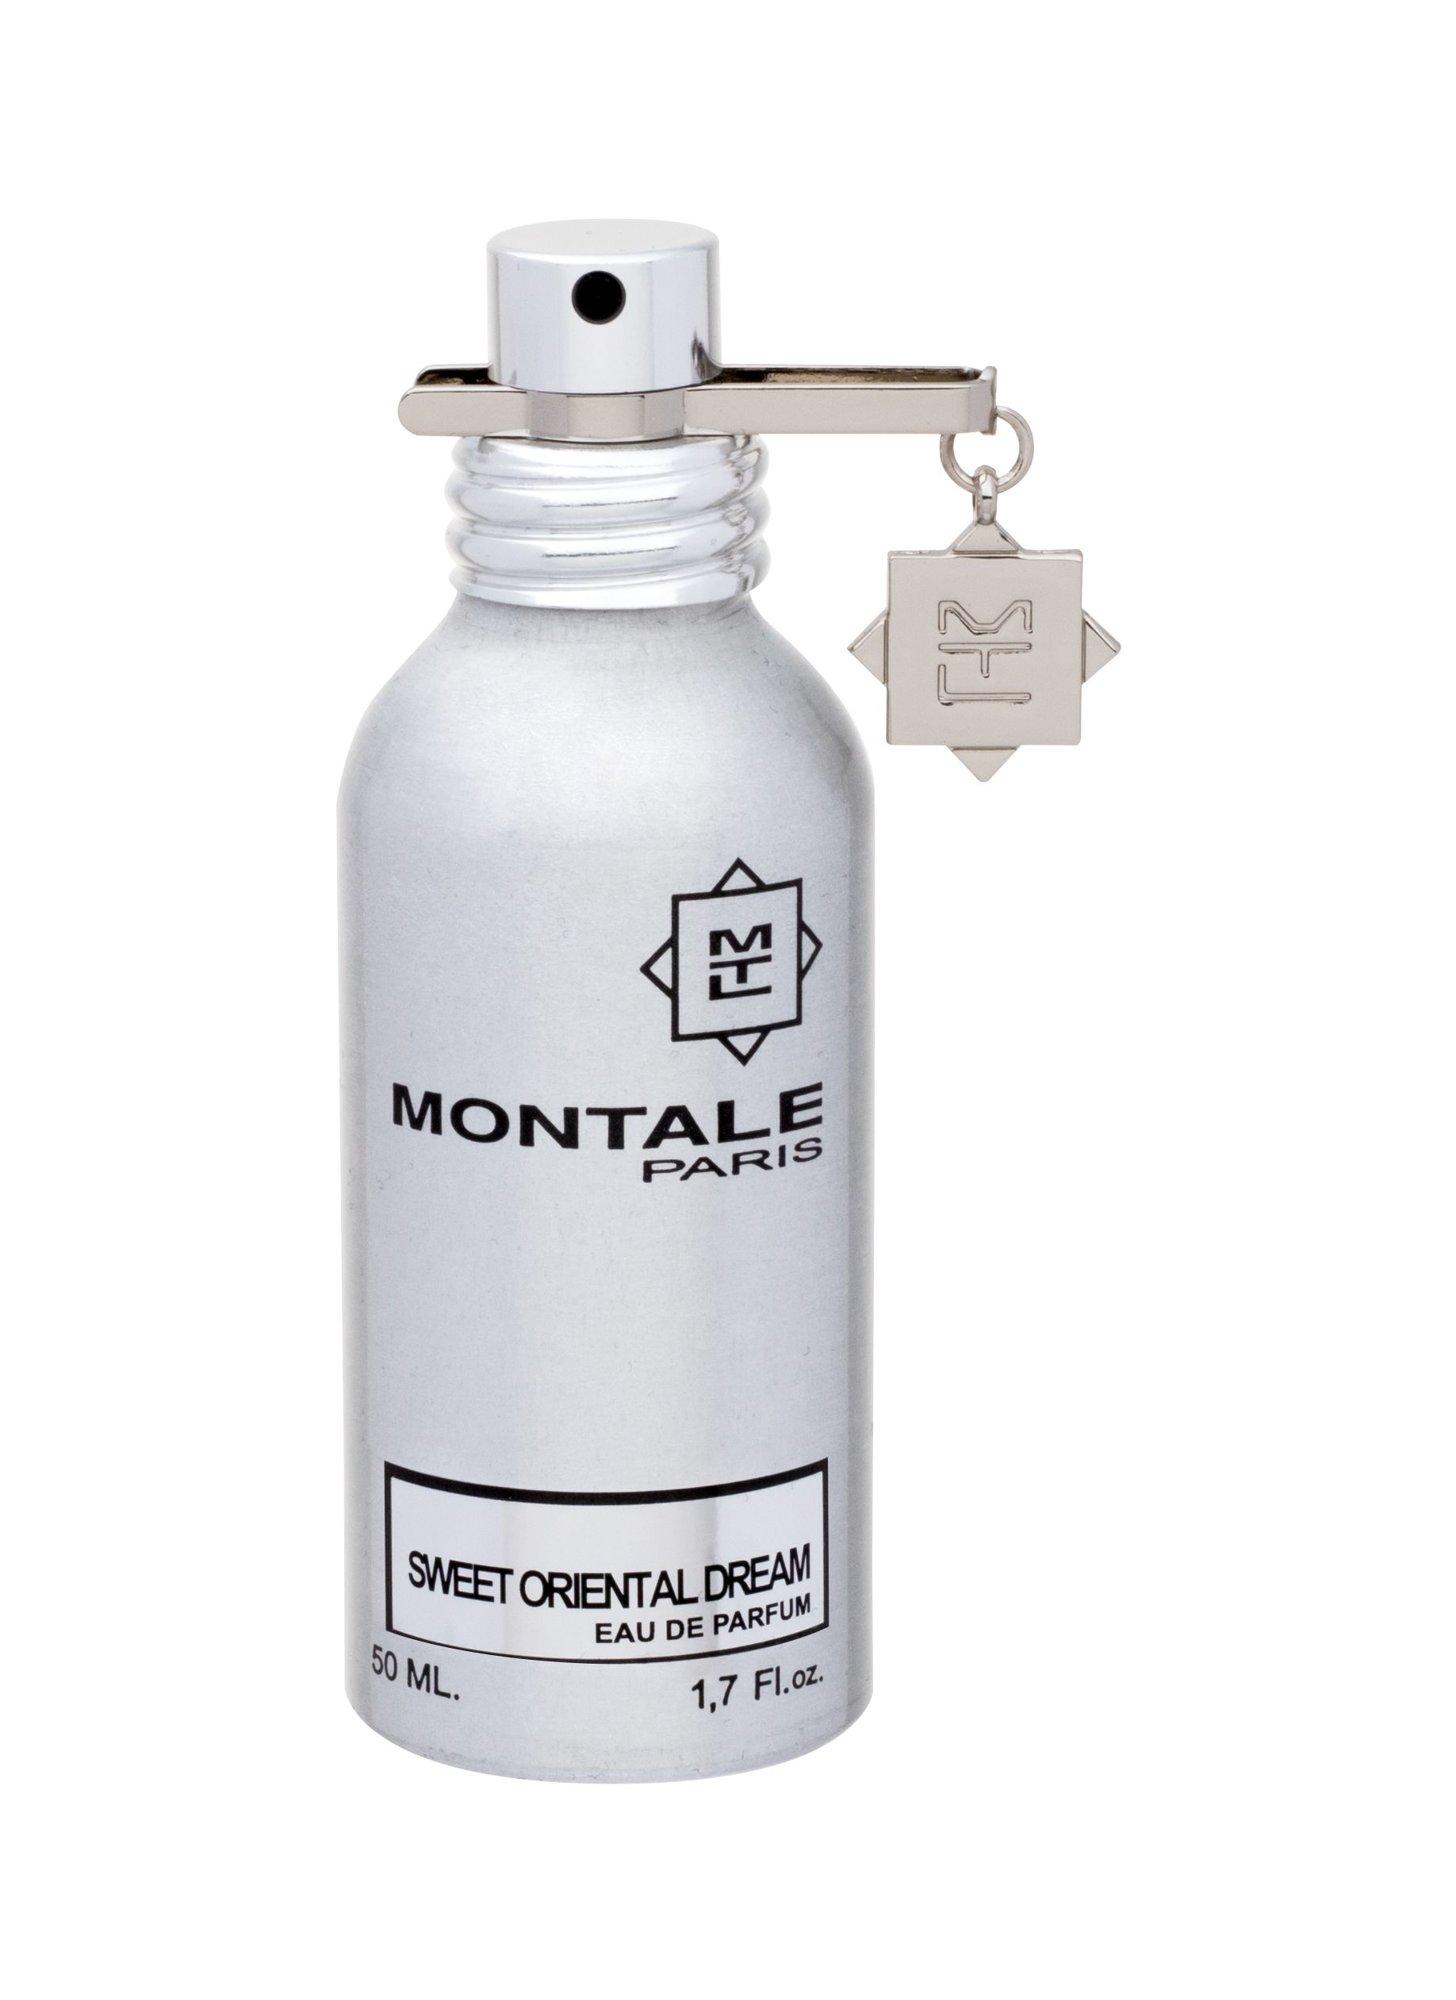 Montale Paris Sweet Oriental Dream EDP 50ml